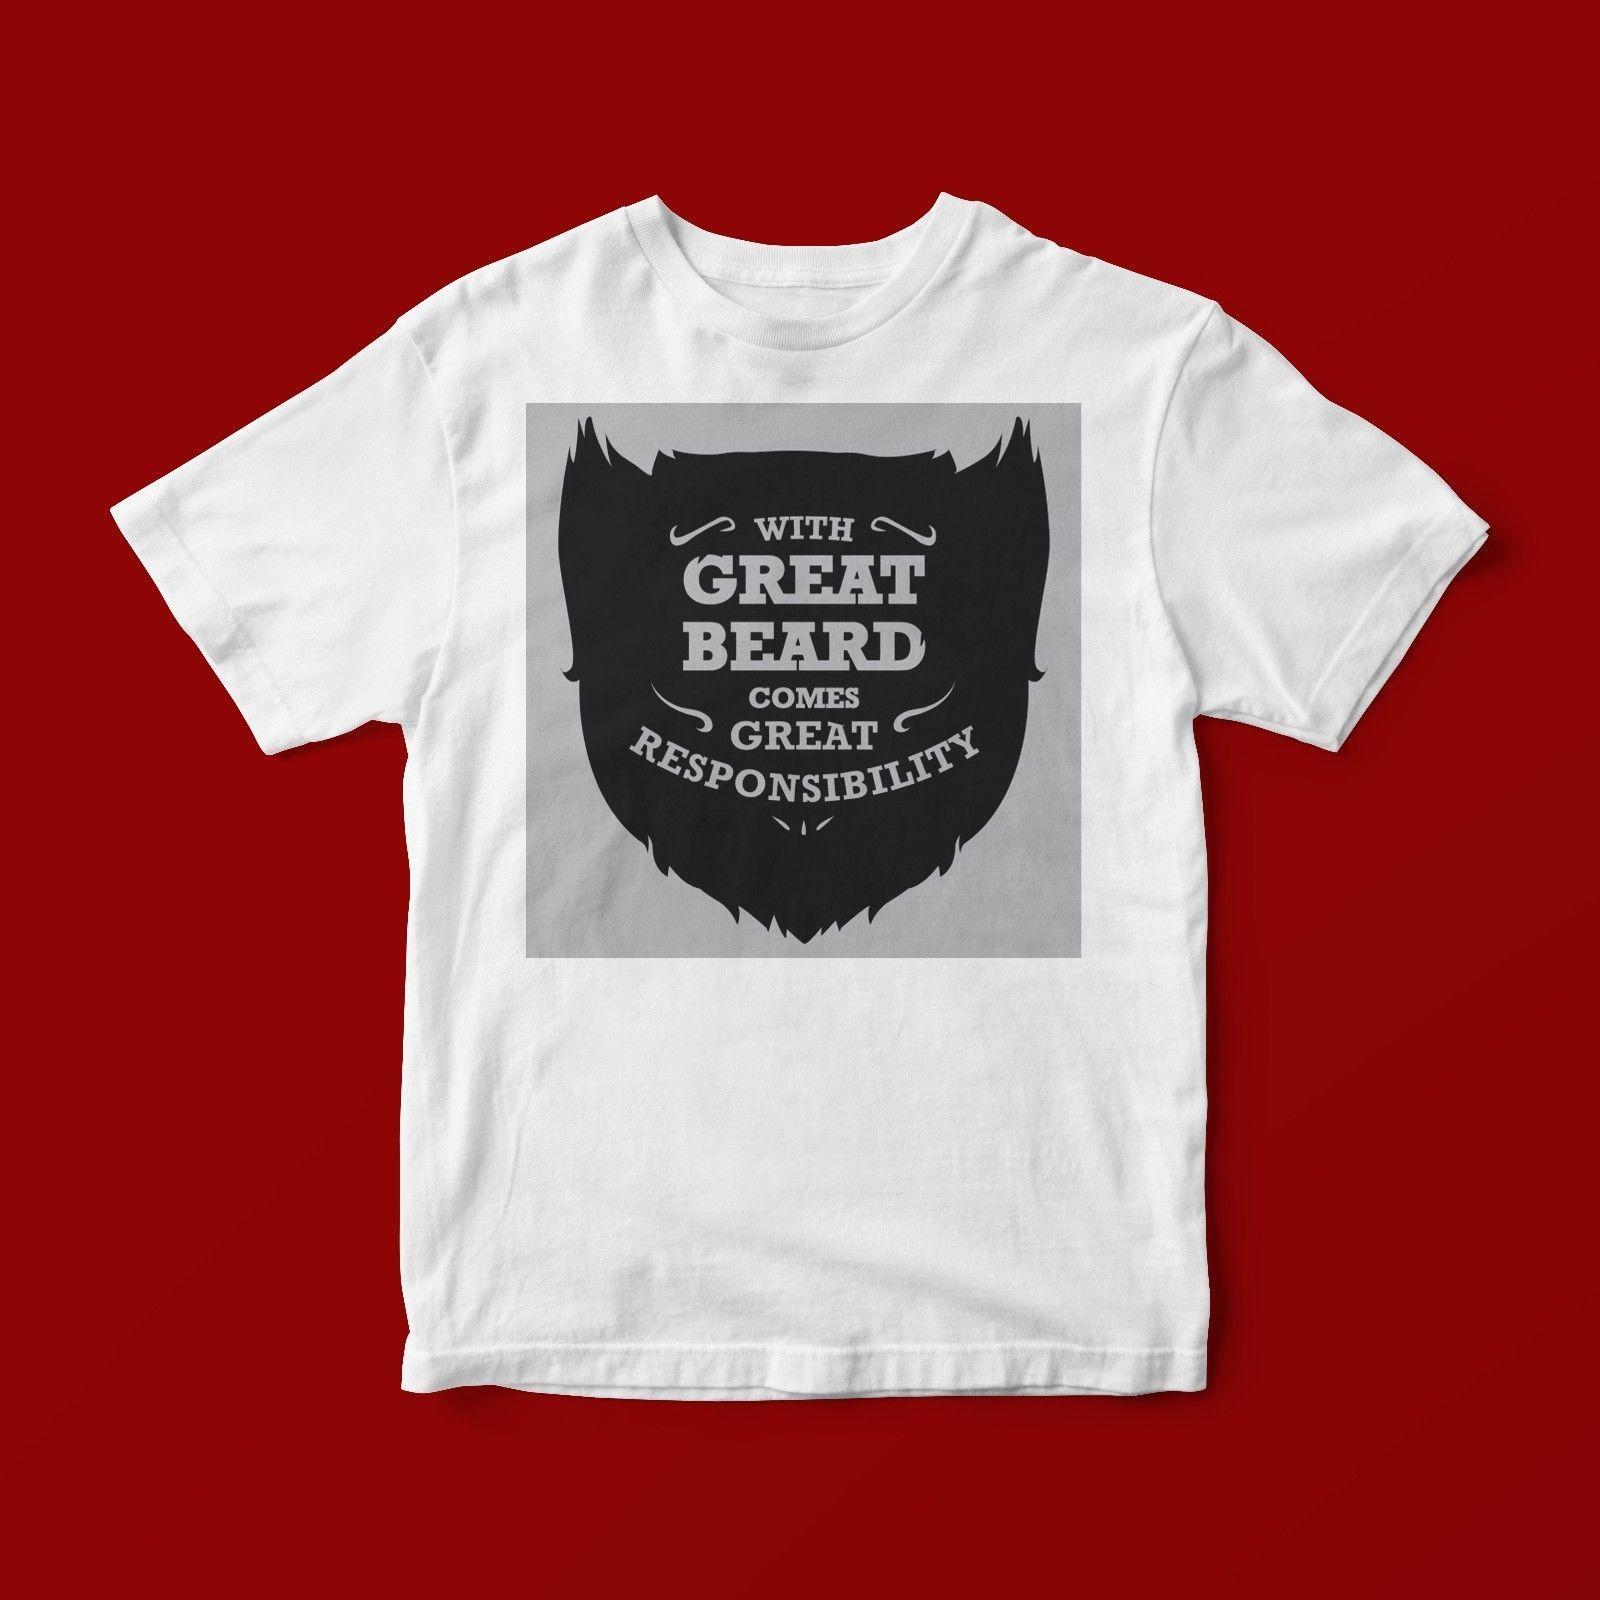 d544a55b GREAT BEARD T SHIRT UNISEX 434 Suit Hat Pink T Shirt RETRO VINTAGE Classic T  Shirt Men T Shirts Geek T Shirts From Tencup, $16.24| DHgate.Com